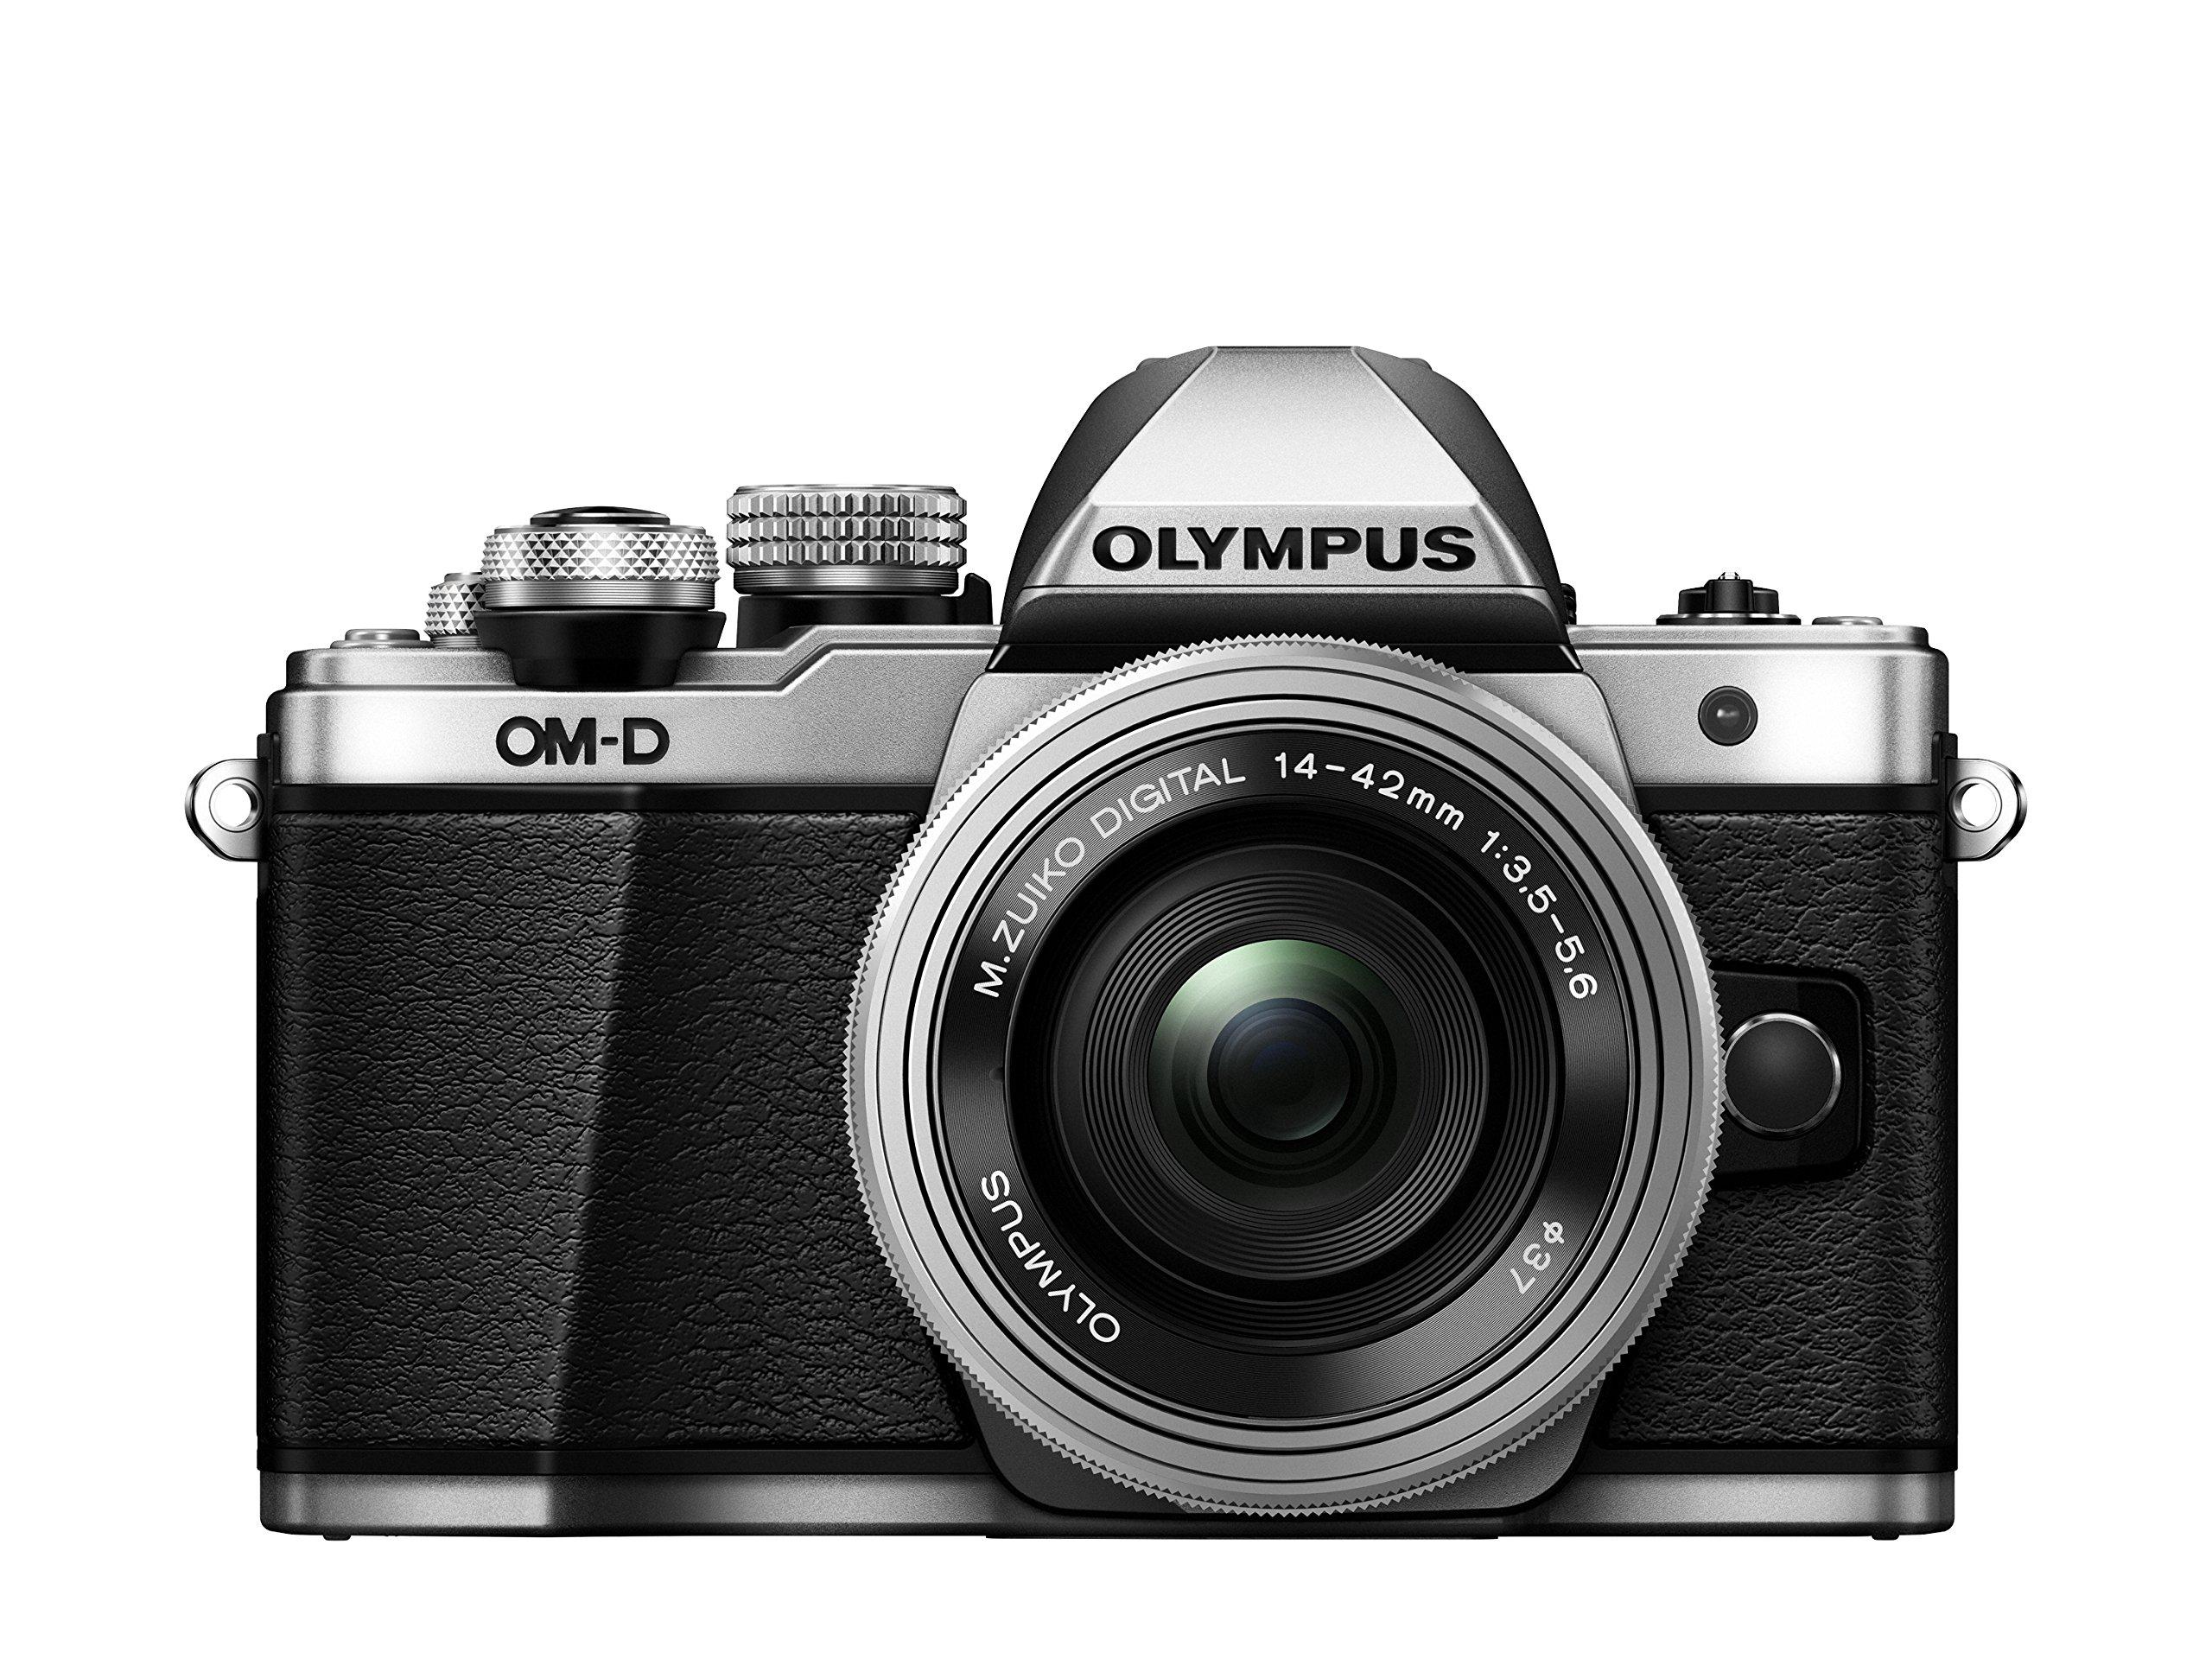 Olympus E-M10 Mark II Kit con Obiettivo M. Zuiko Digital ED 14‑42mm 1:3.5‑5.6 EZ Pancake, Argento product image